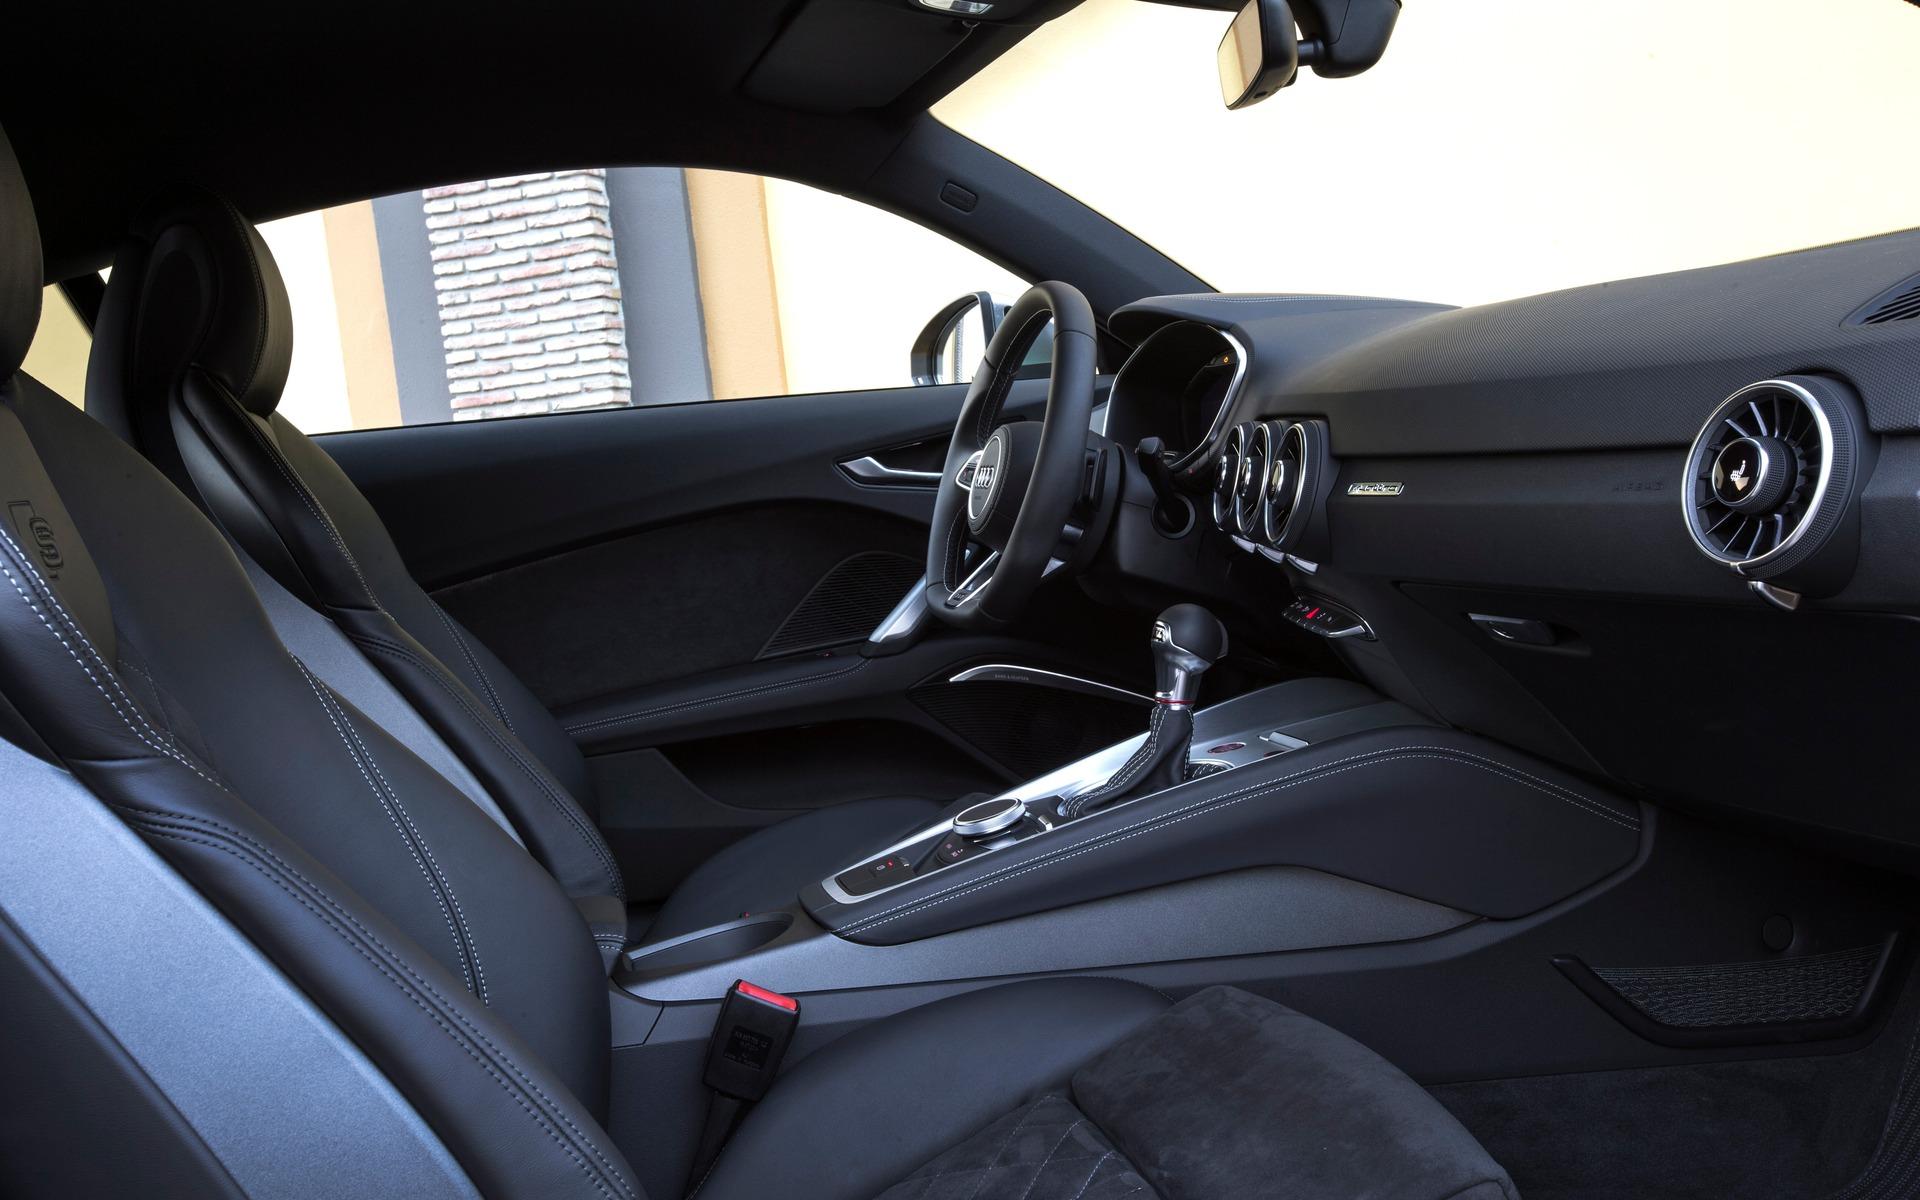 2016 Audi Tt A Close Encounter Of The Third Kind 13 20